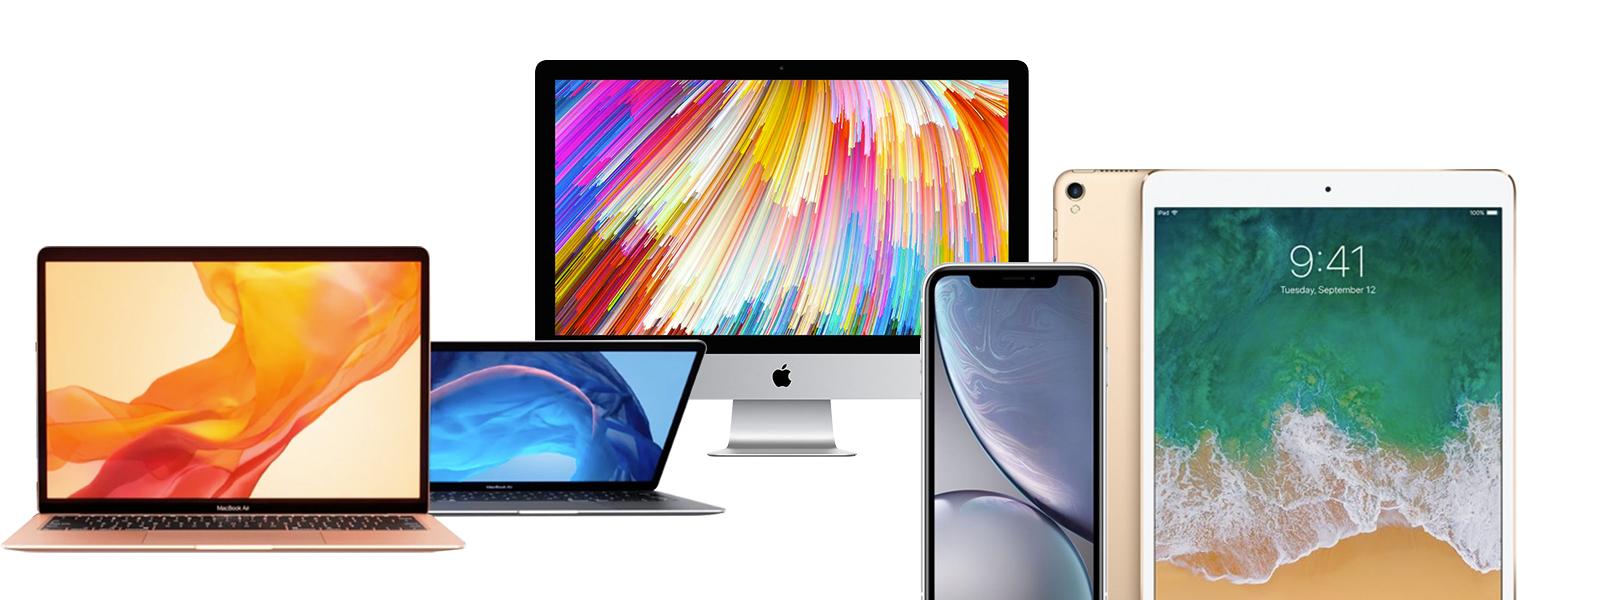 Wide range of Refurbished Apple products